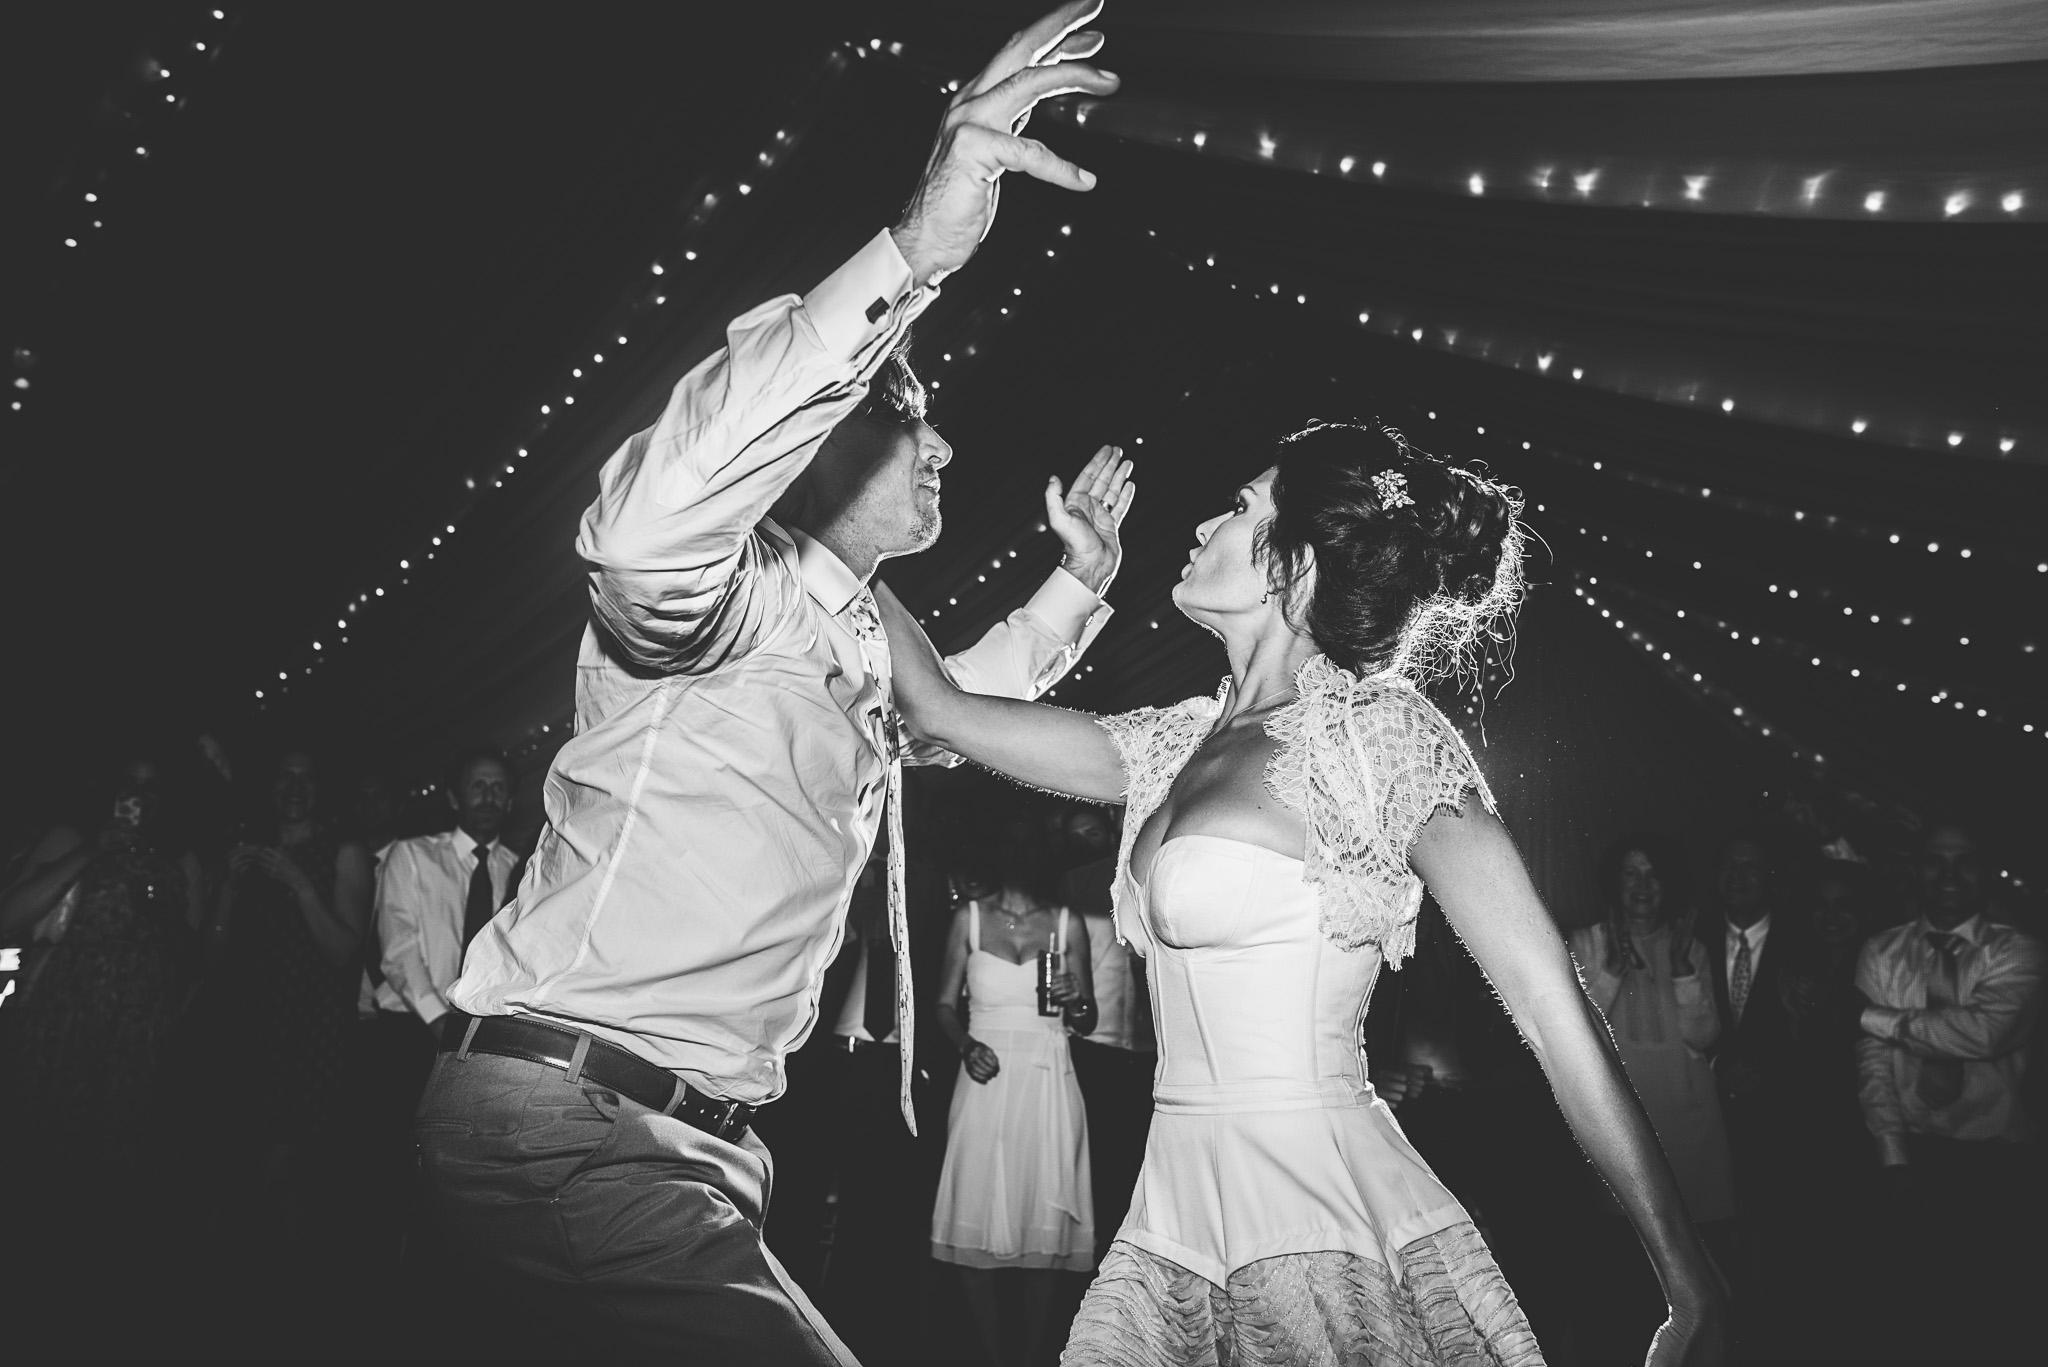 Lara & Jack Wedding 220815 by Barney Walters_1048_BW2_0972